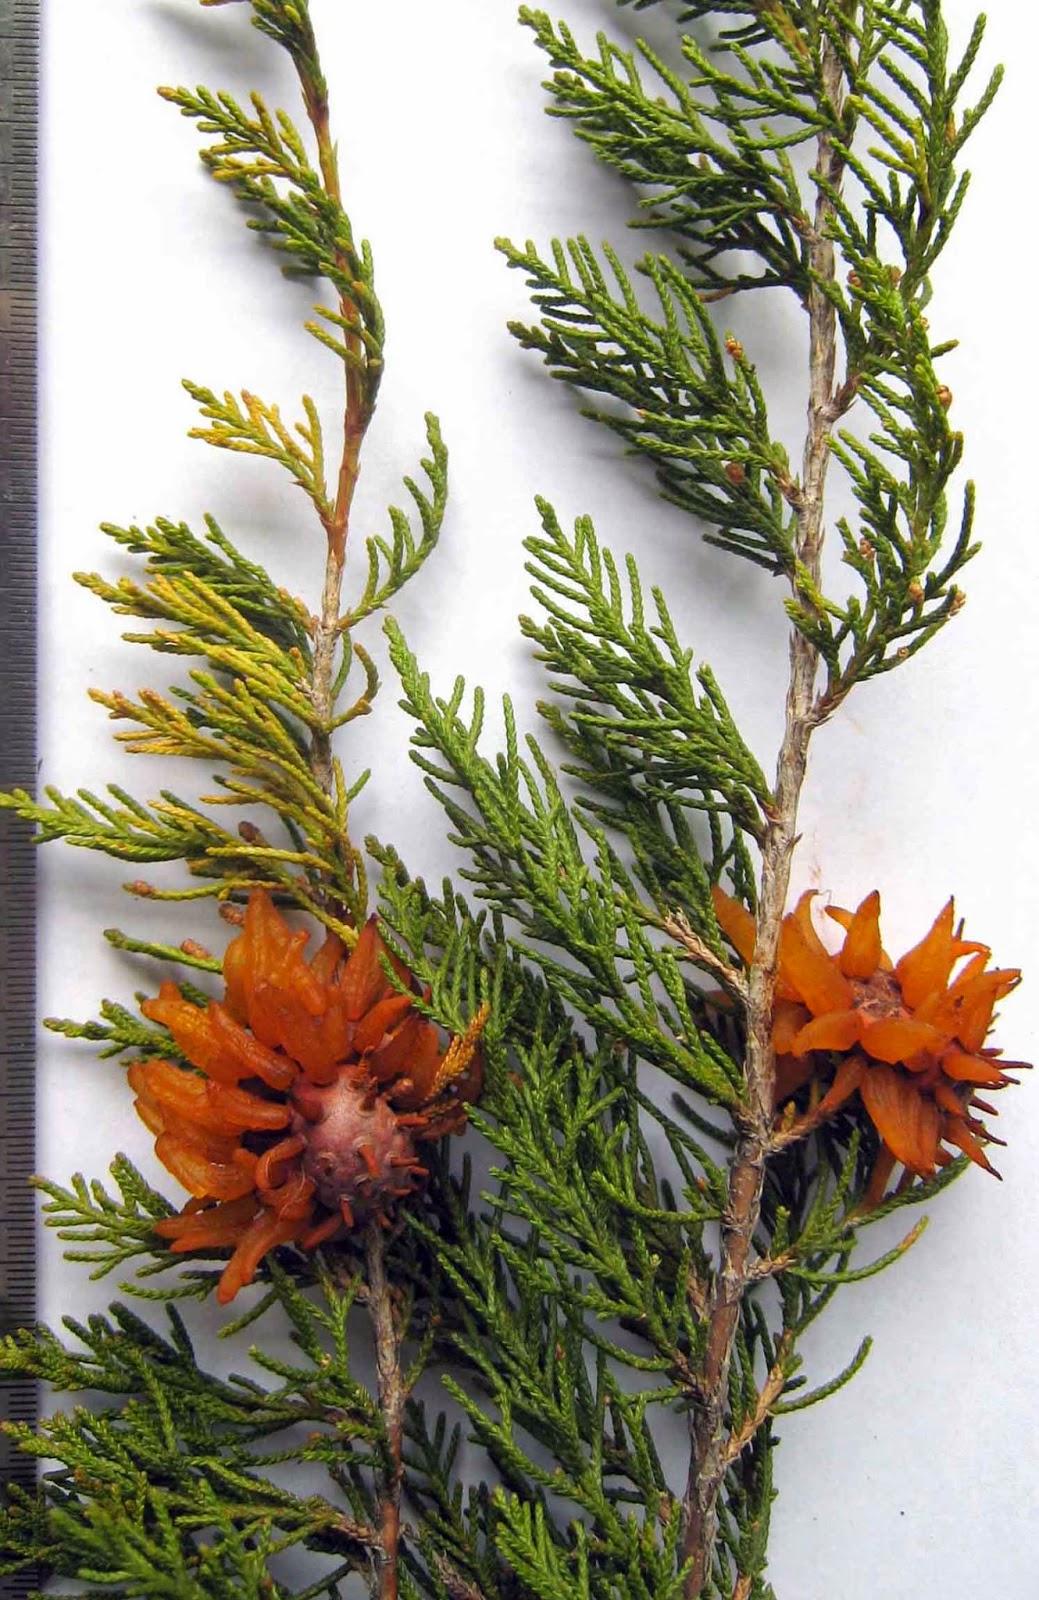 Gymnosporangium juniperi-virginianae on cedar